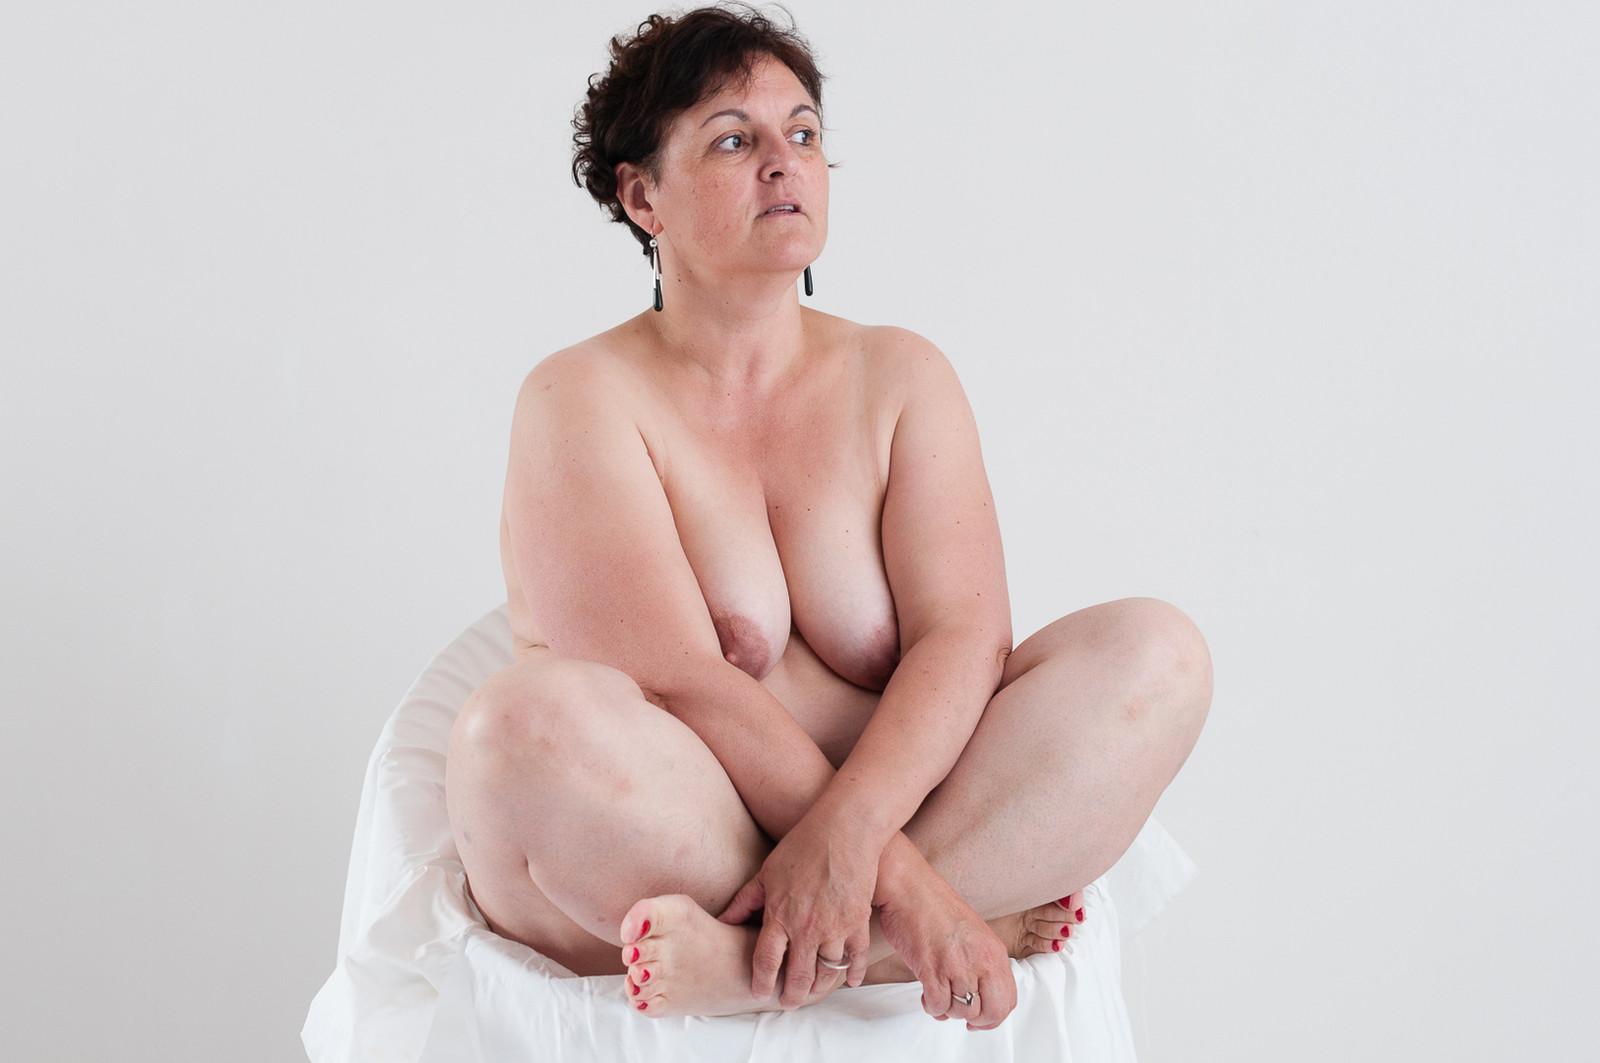 Big Black Cocks porno pics